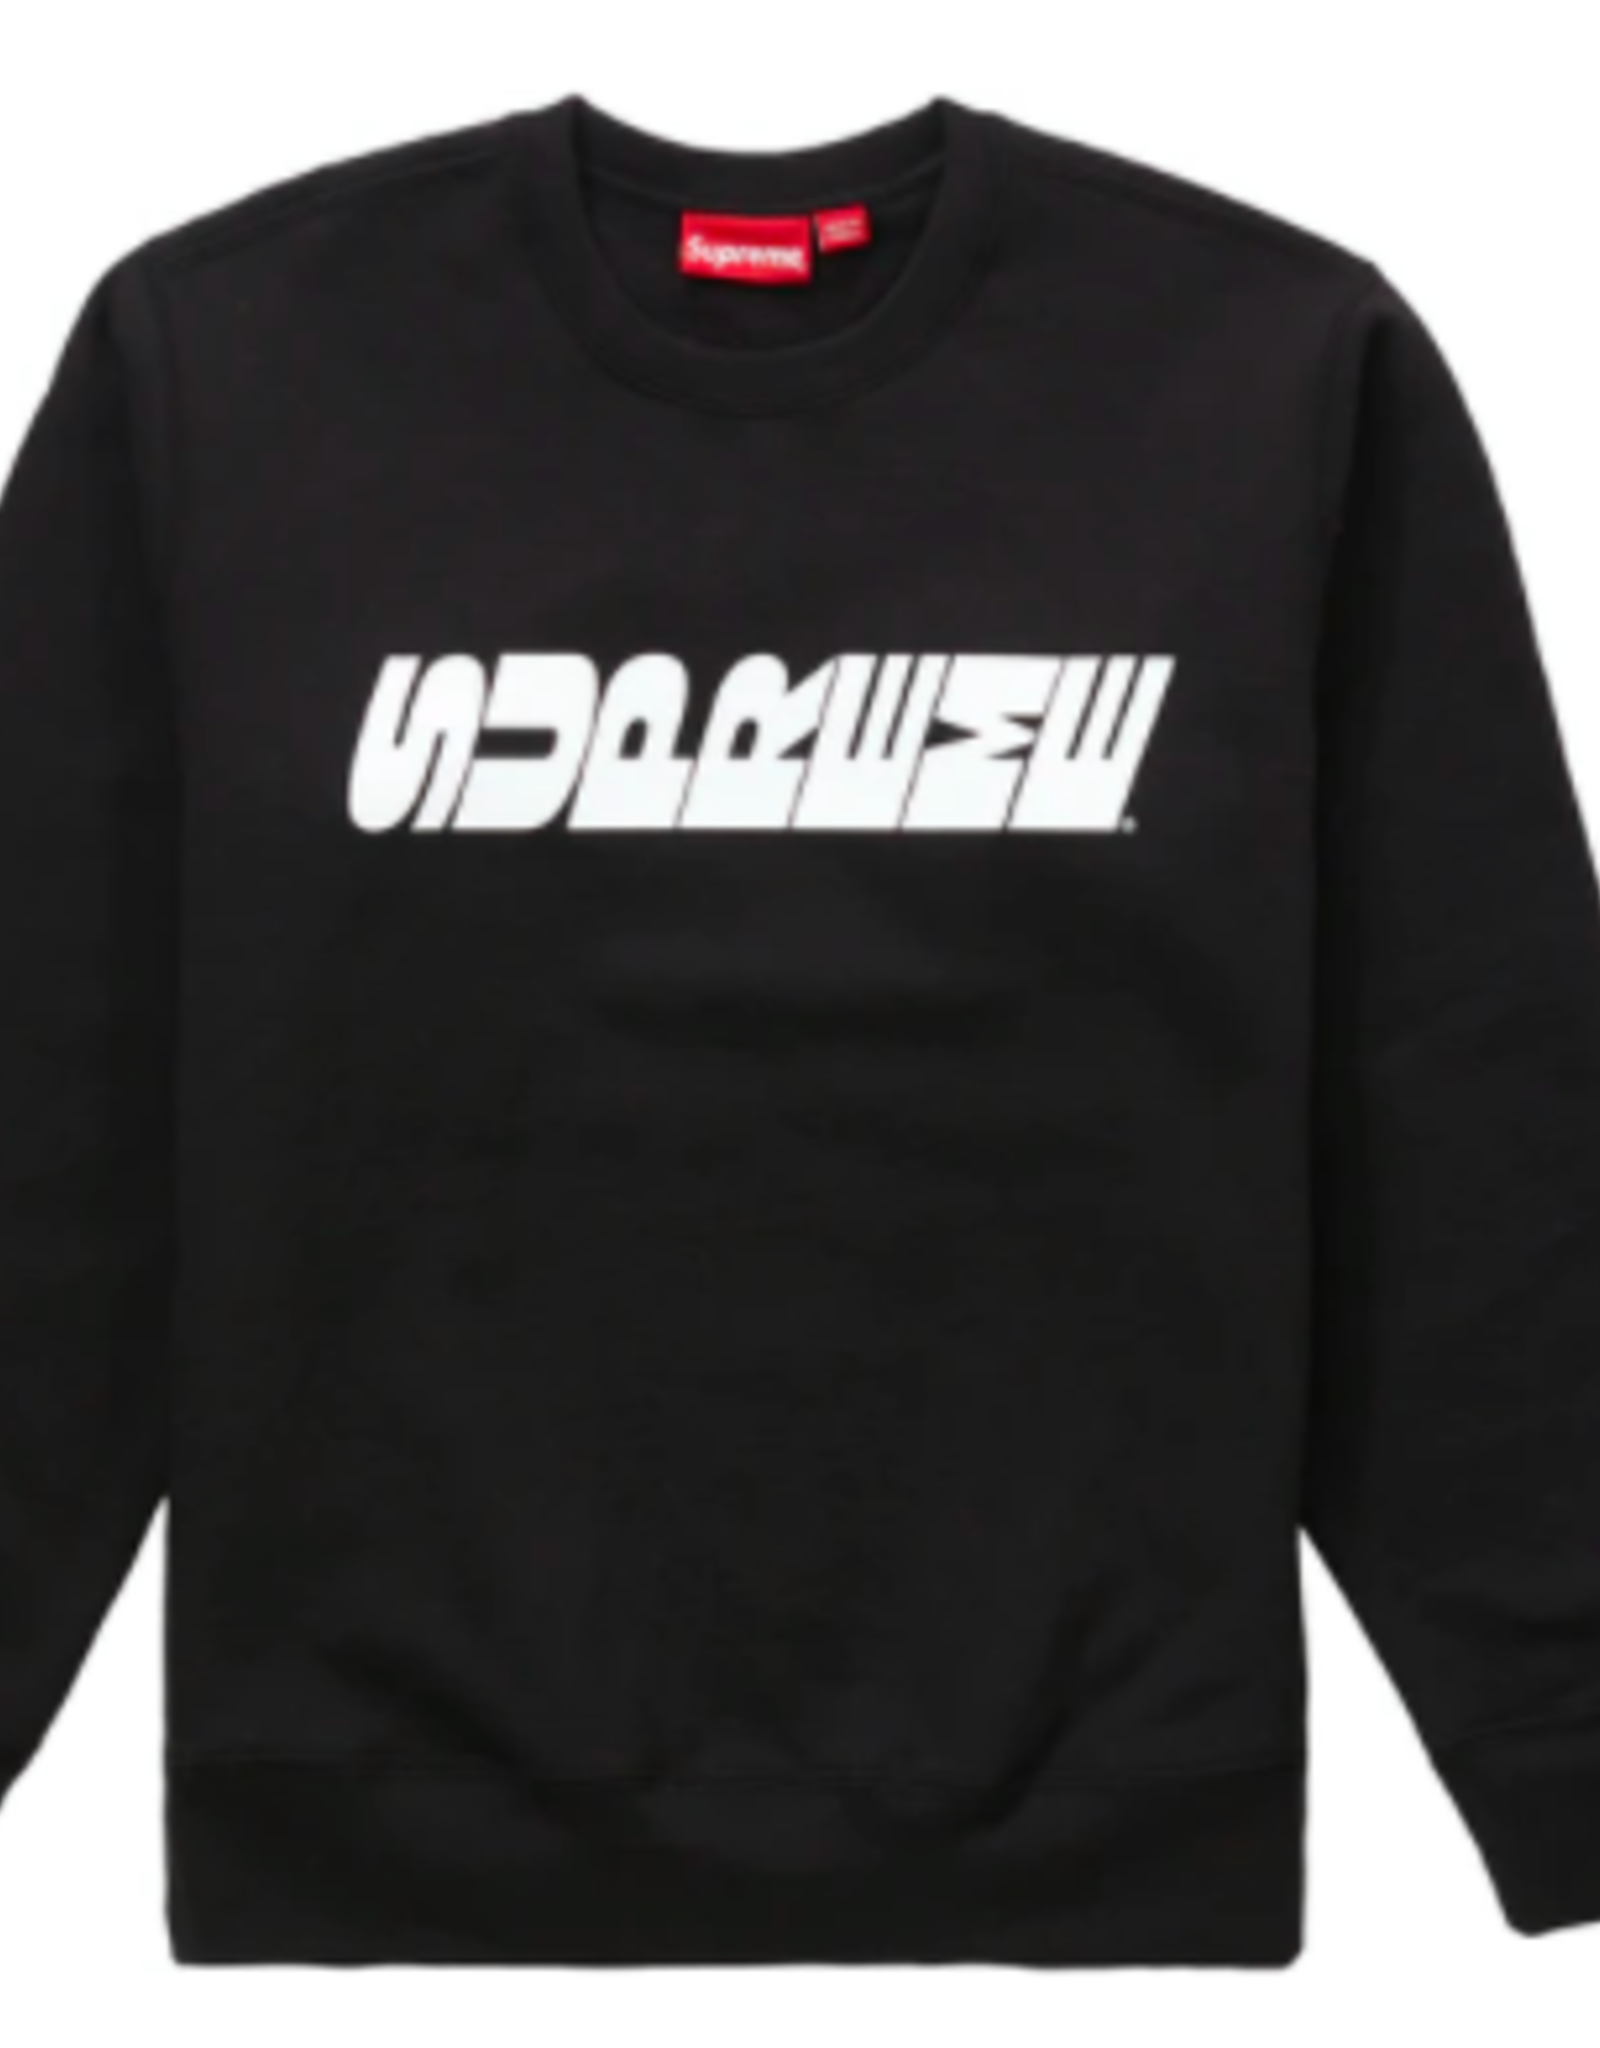 SUPREME Breed Crewneck Black XL